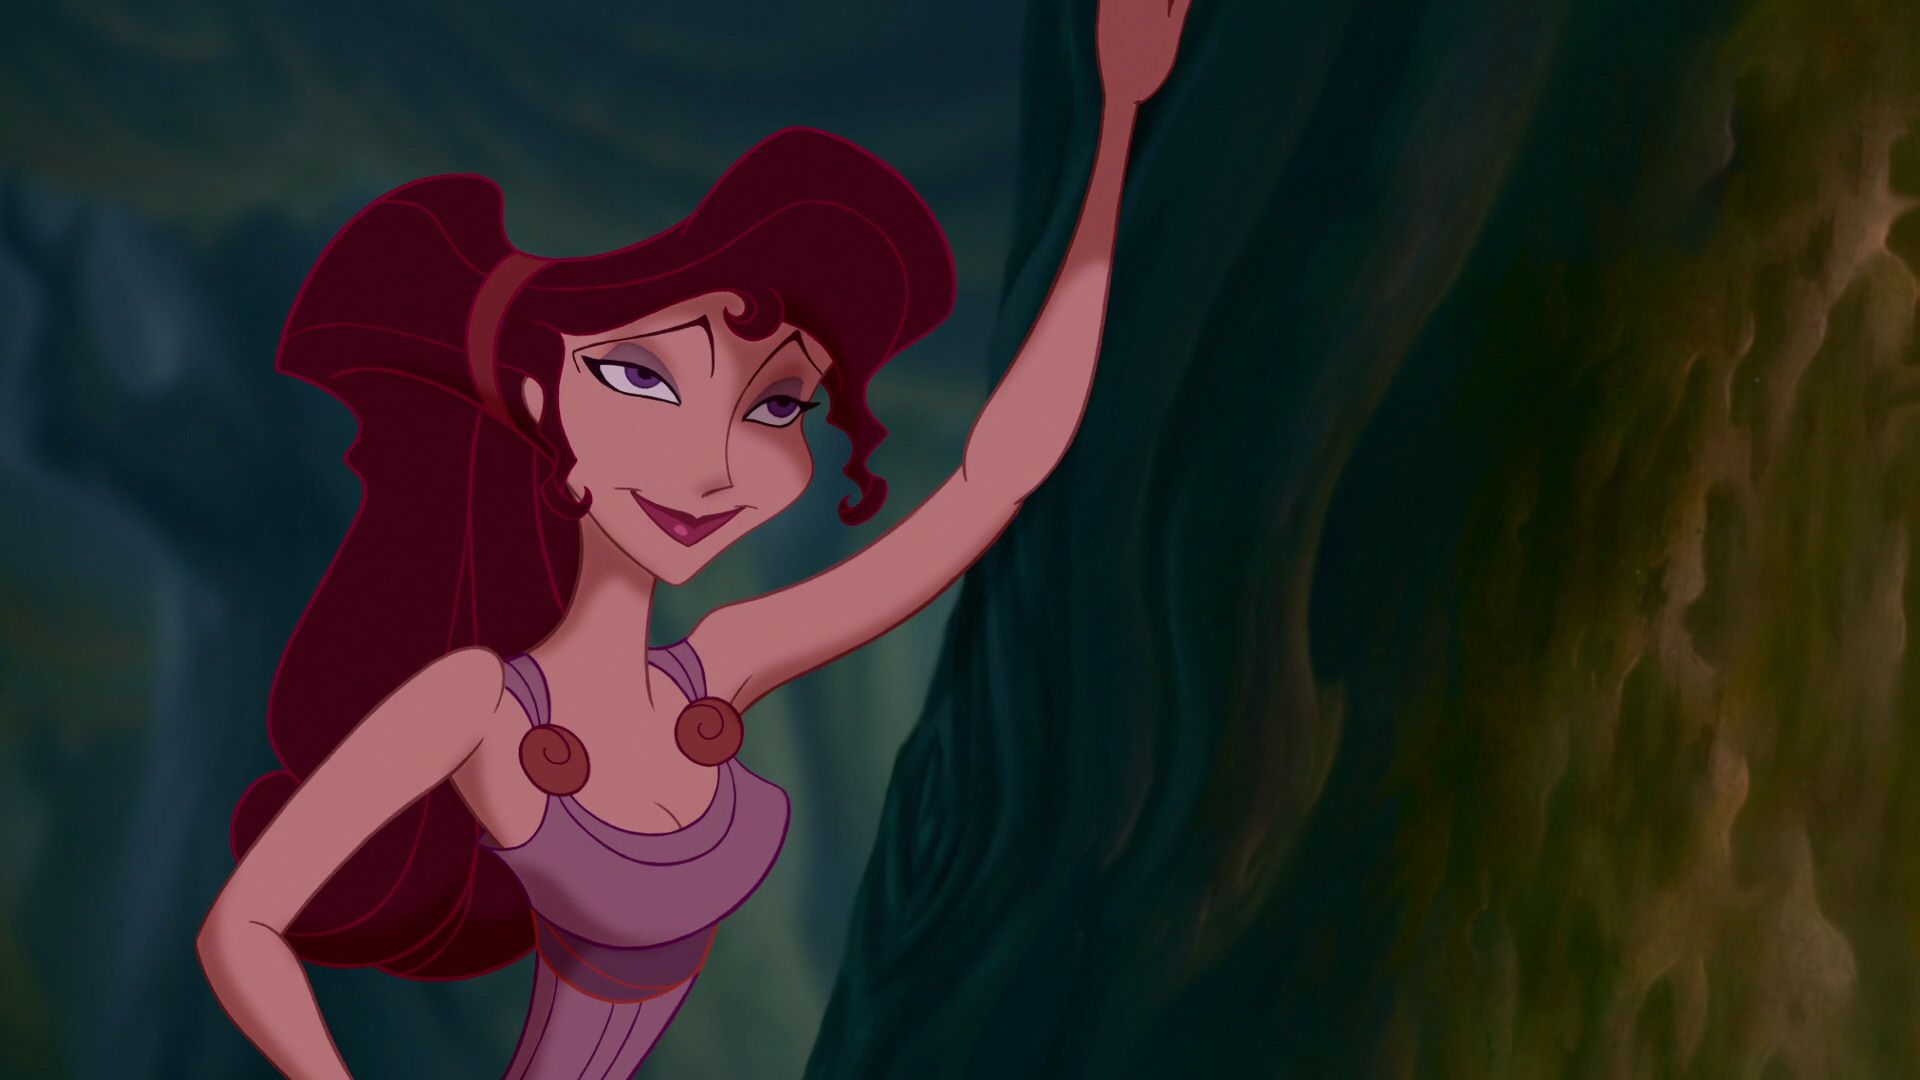 Megara | Forgotten disney princesses, Disney princess ...